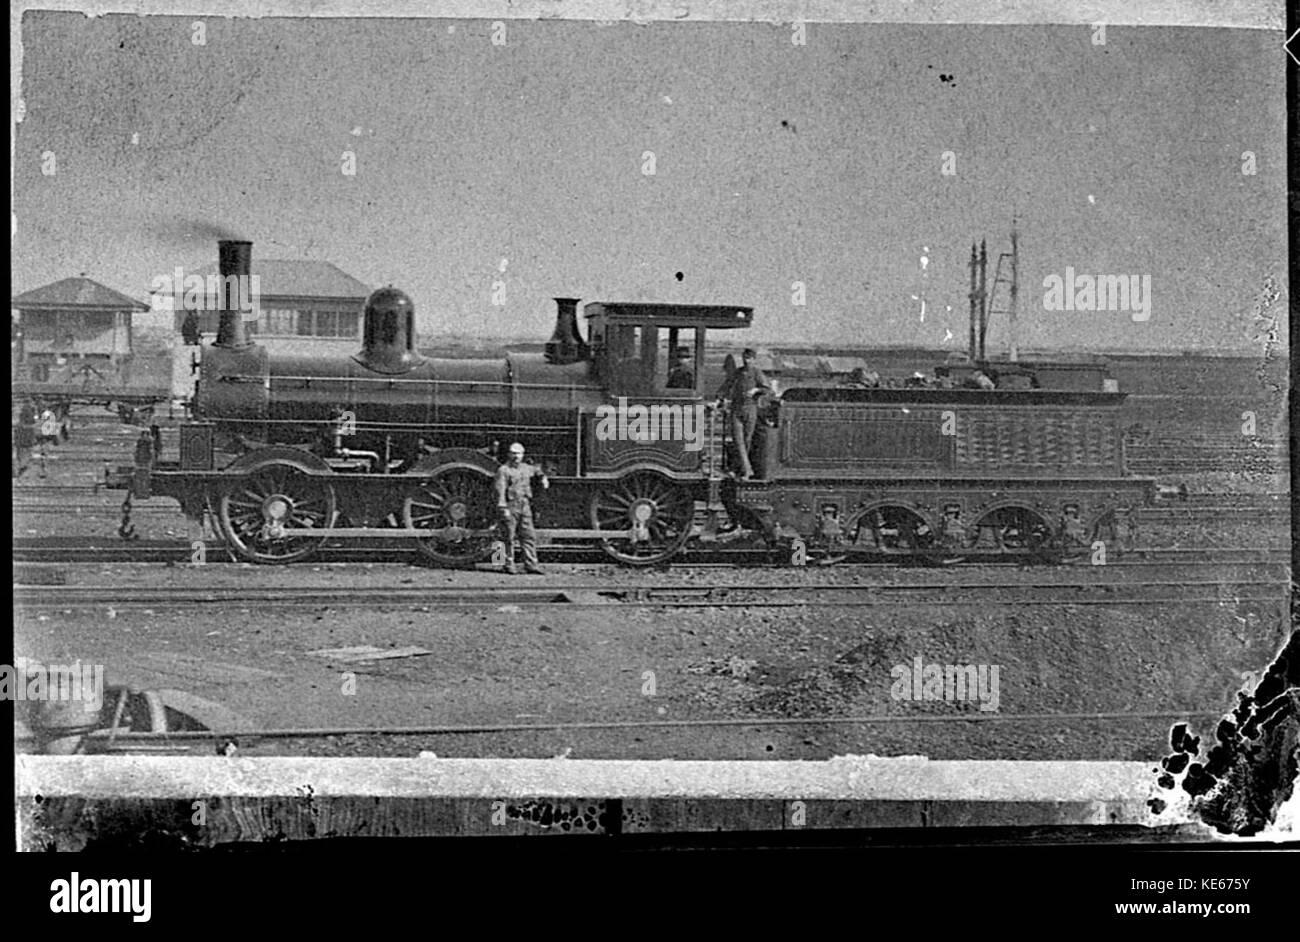 28750 Victorian Railways Beyer Peacock Q class steam locomotive ca 1870 copy photograph 1940s - Stock Image